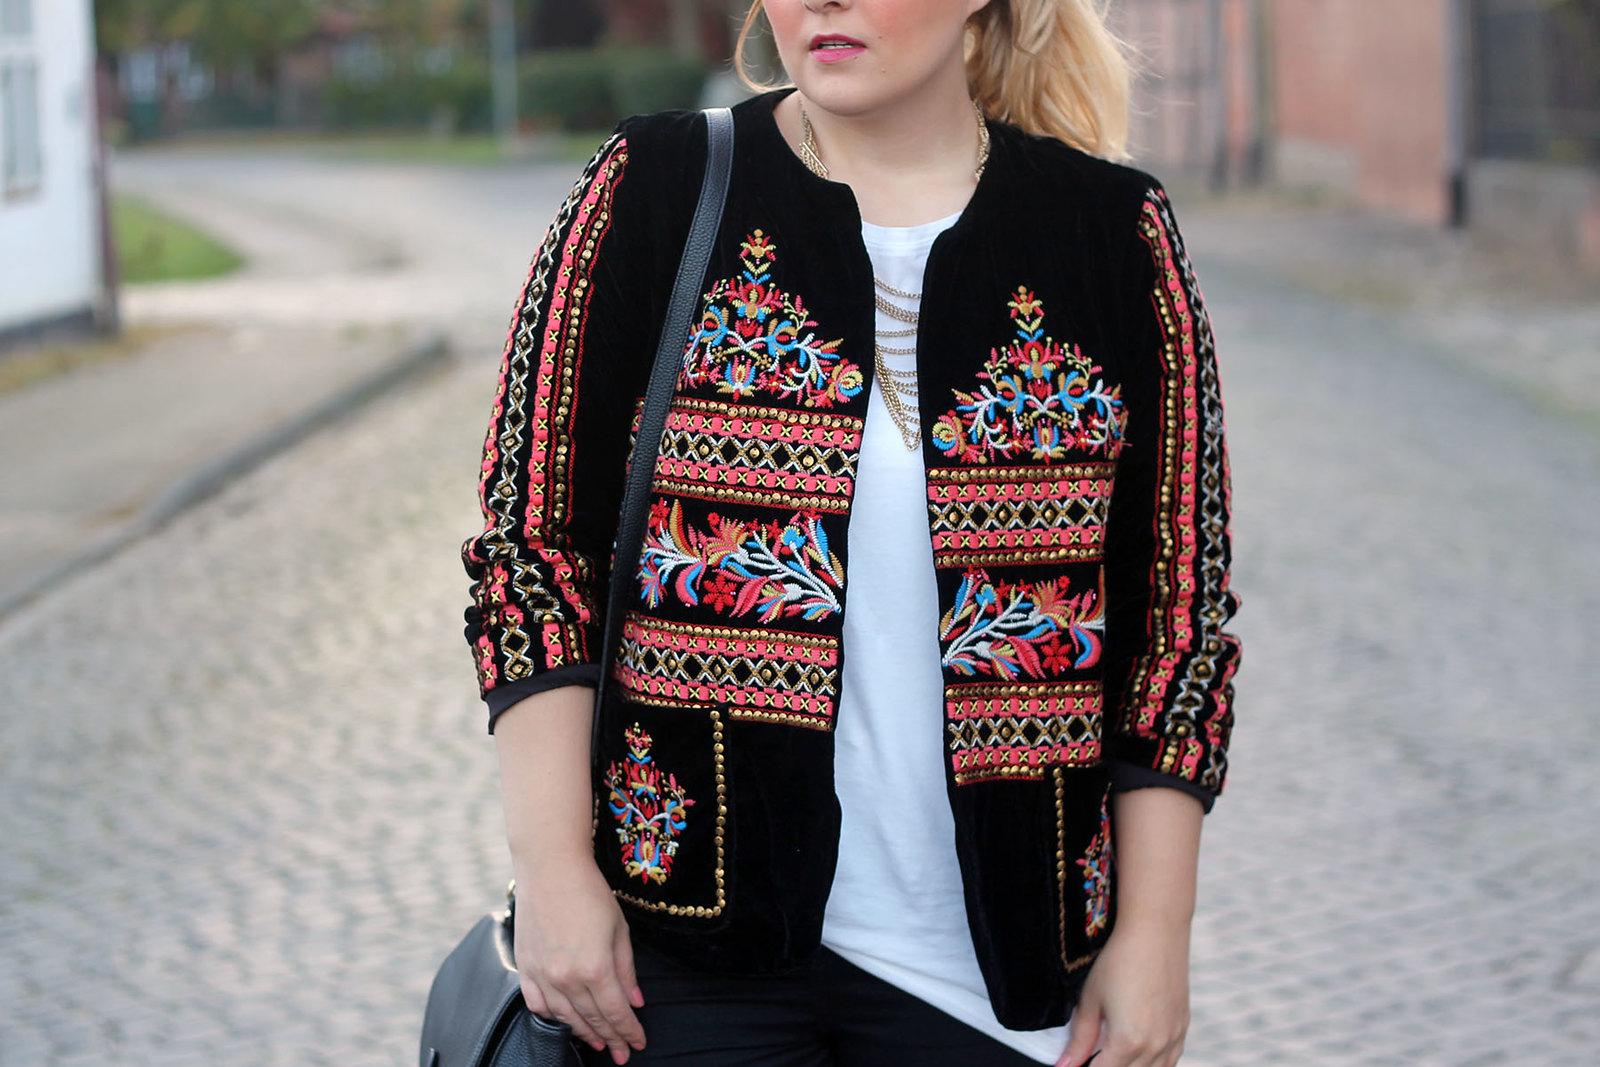 boho-jacke-style-trend-zara-fashionblog-modeblog